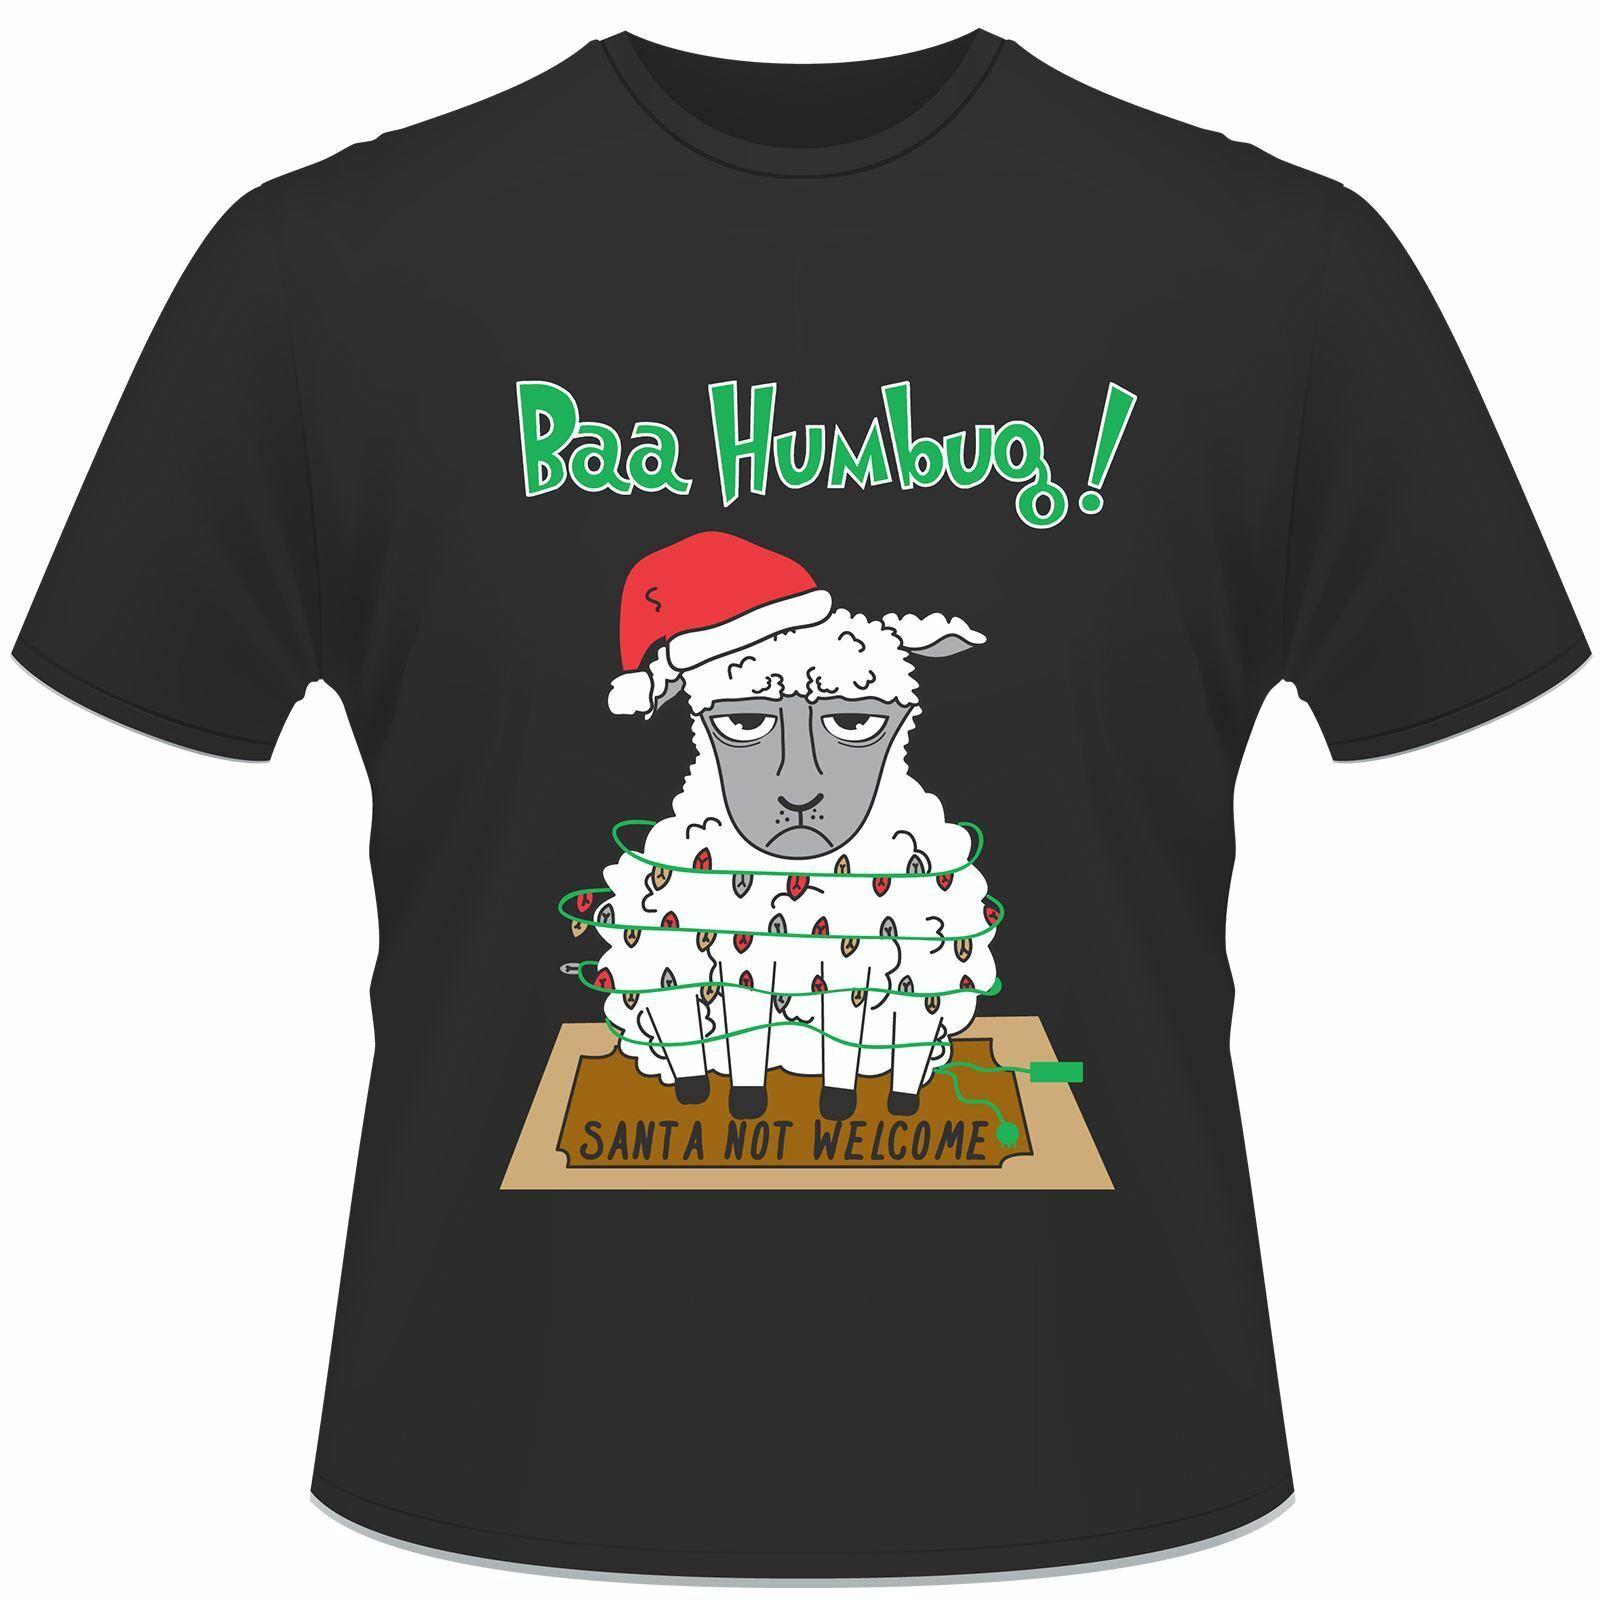 Unisex Christmas Santa Not Welcome Printed Black T-Shirt